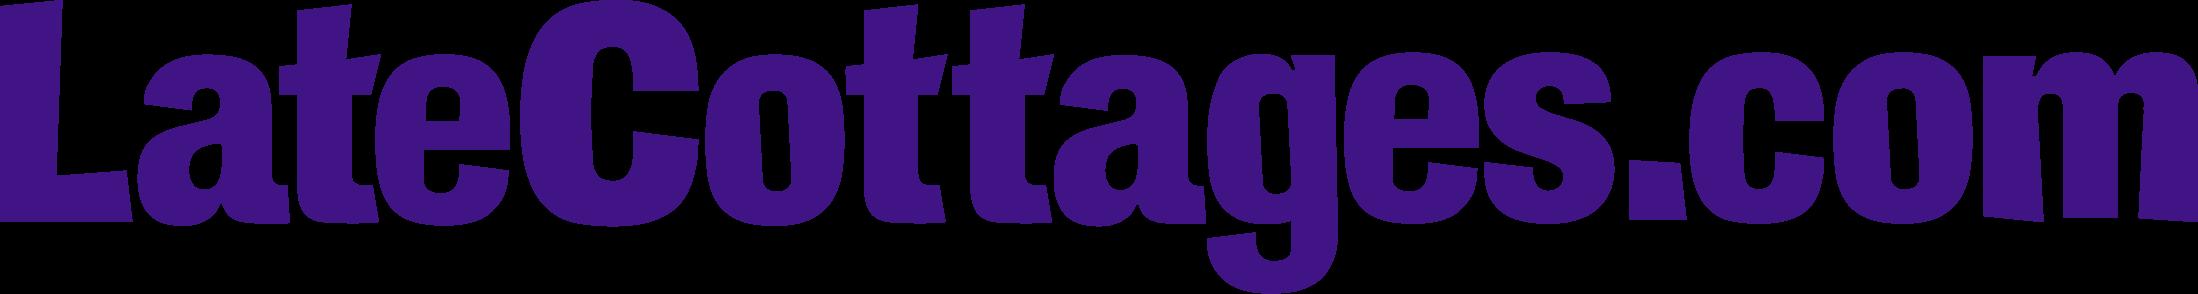 Late Cottages horizontal logo